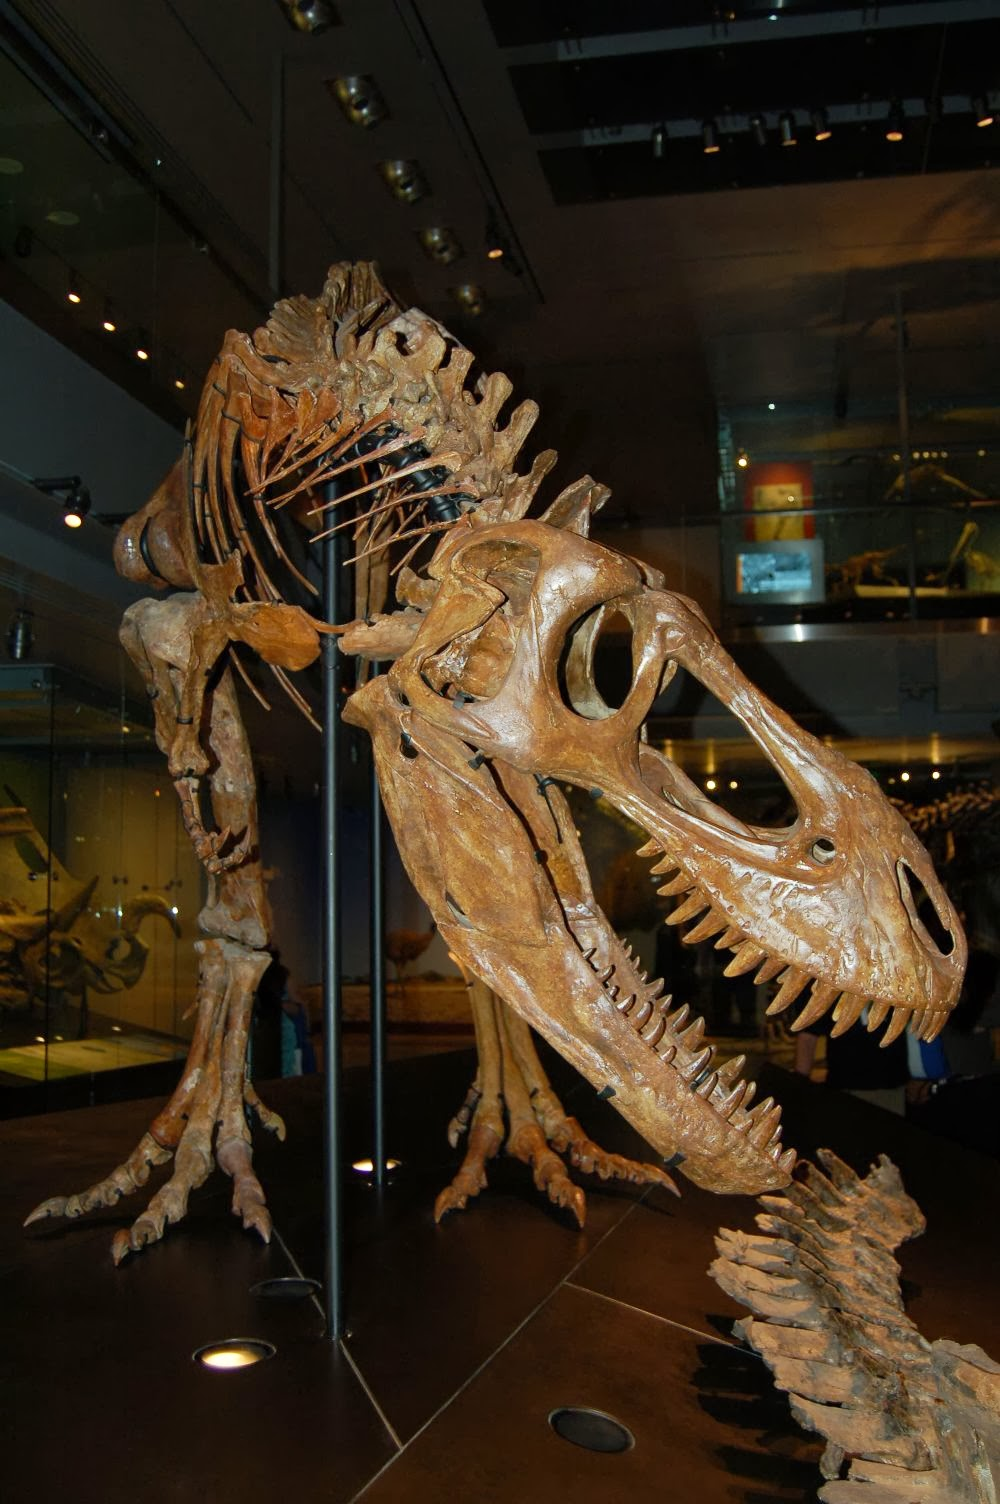 Saurian: Tyrannosaurs at Christmas